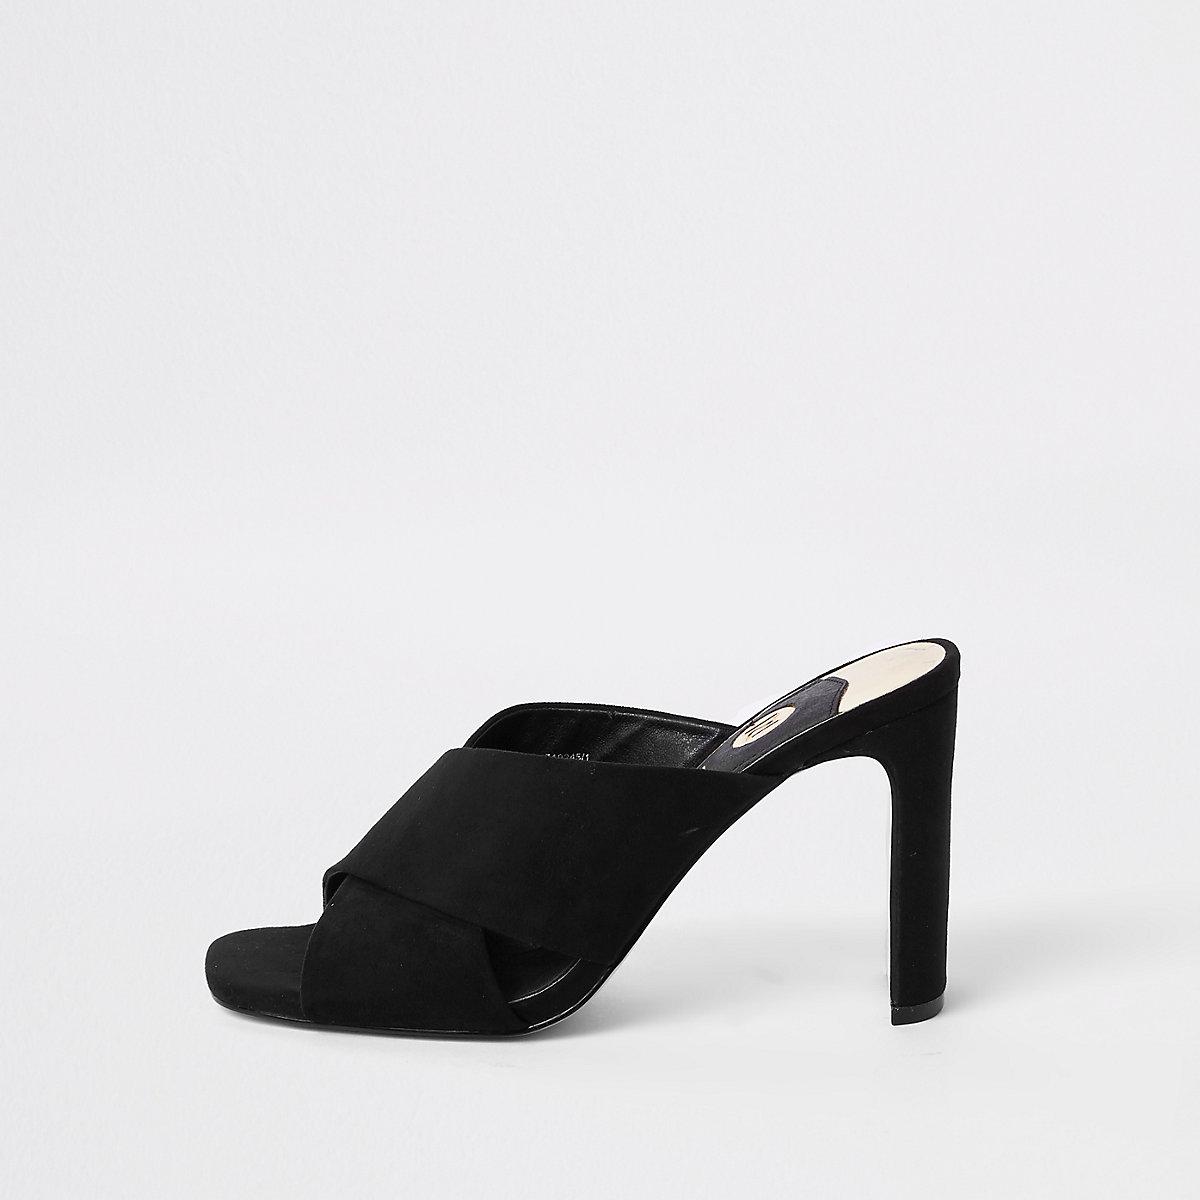 Zwarte sandalen met gekruiste bandjes en smalle hak